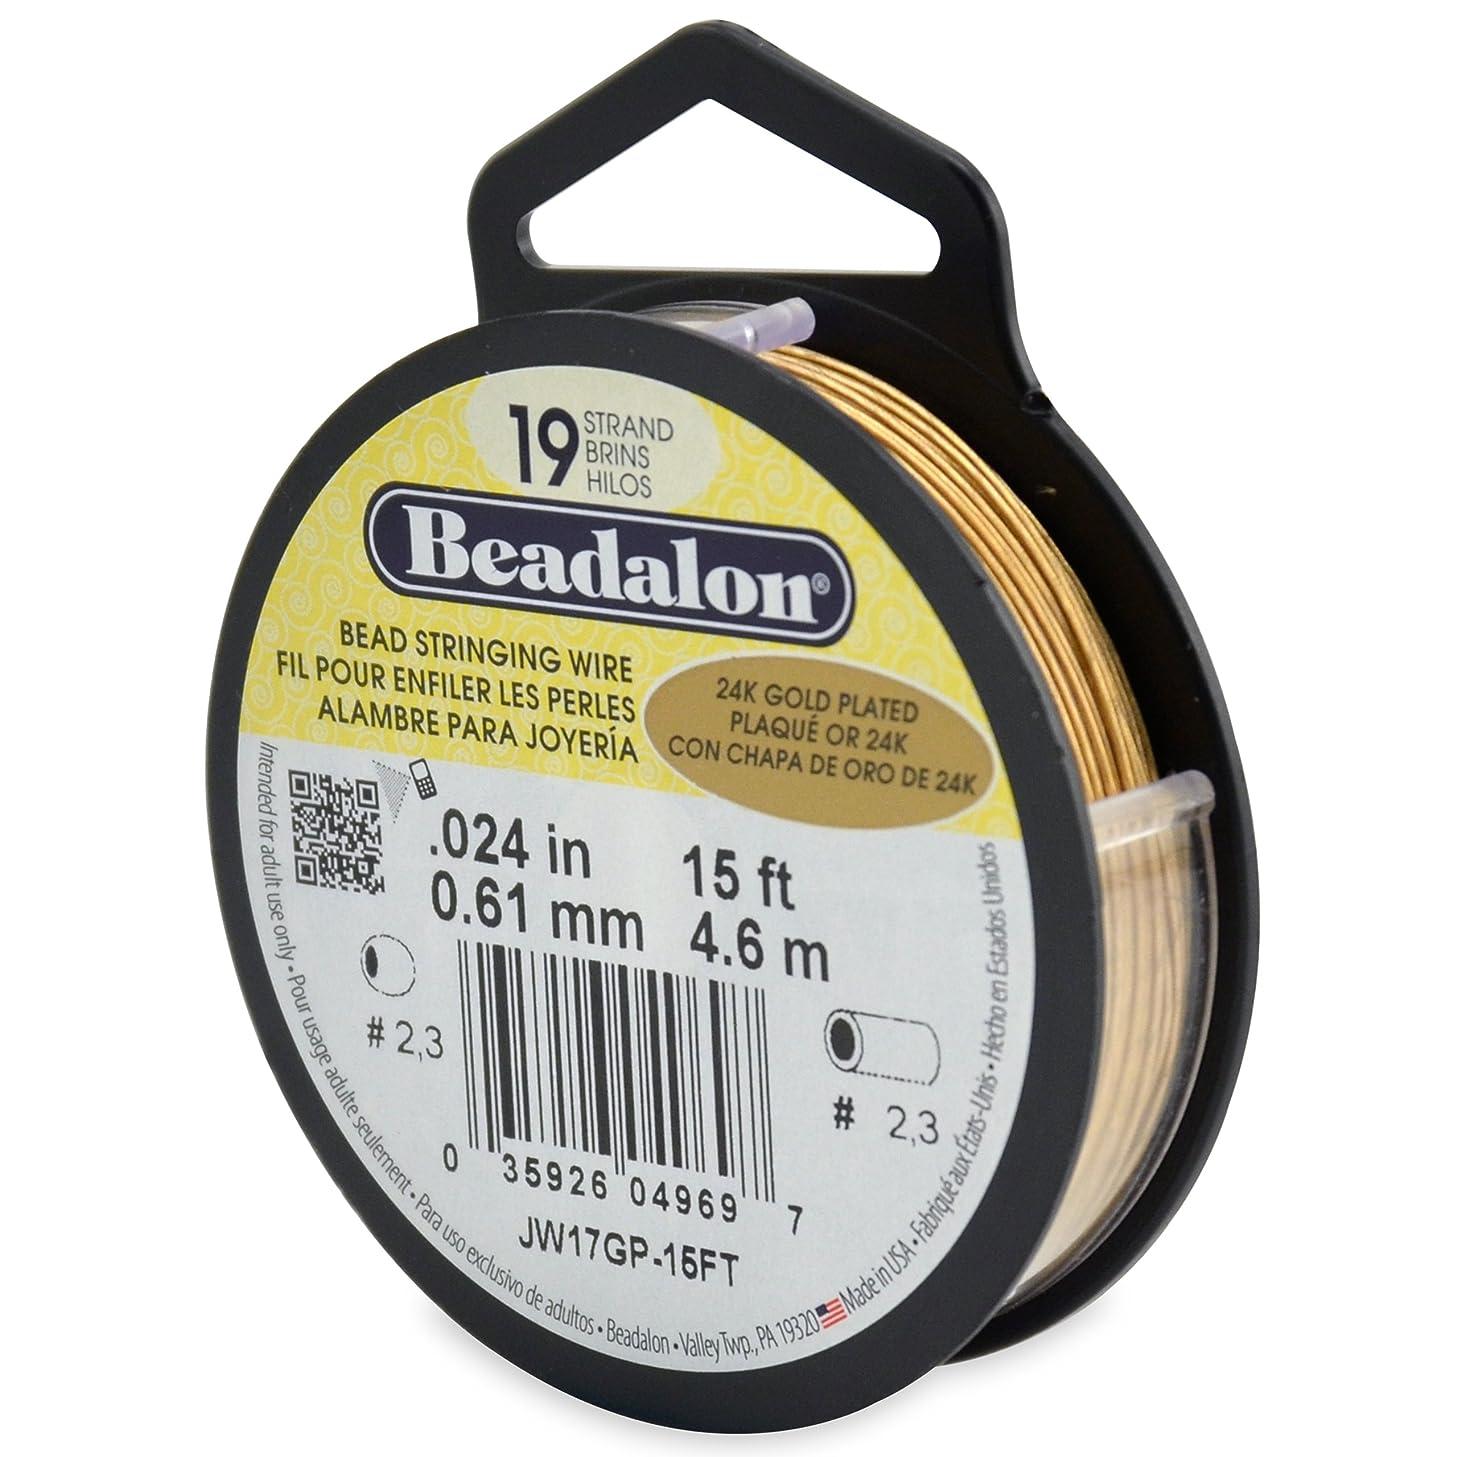 Beadalon 19-Strand Bead Stringing Wire, 0.024-Inch, Gold Plated, 15-Feet